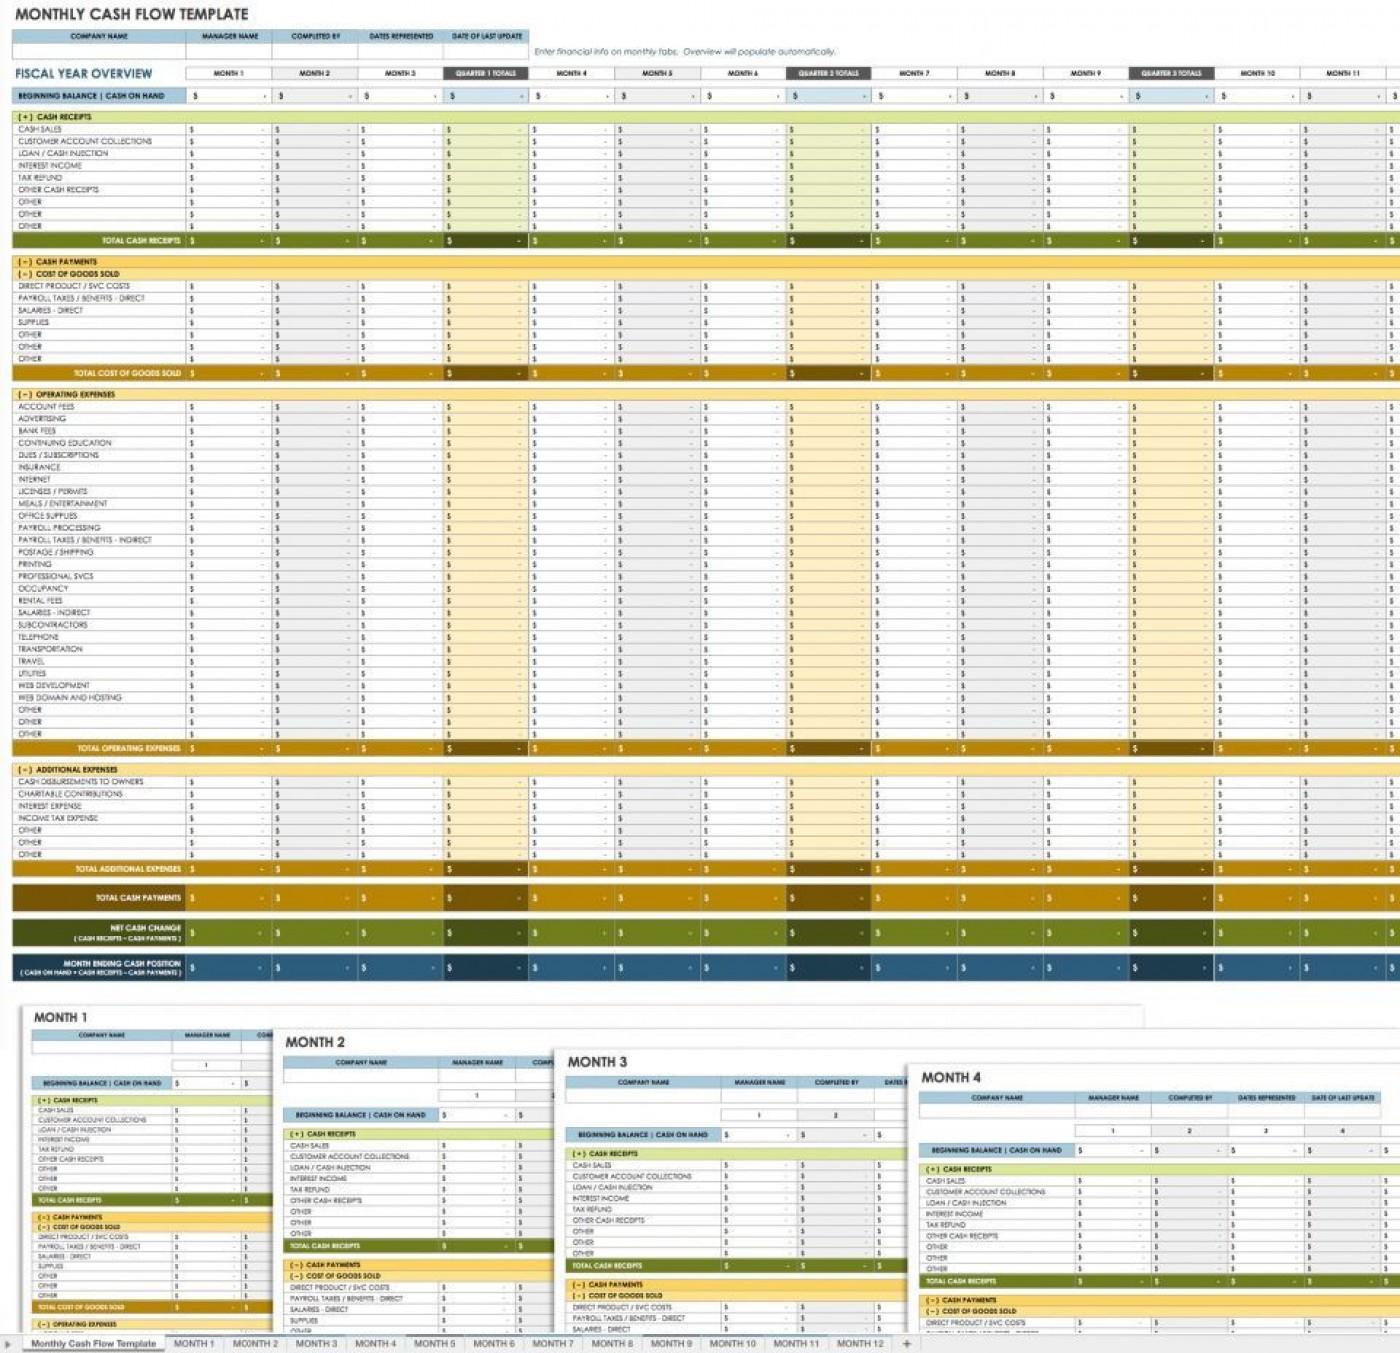 006 Unusual Monthly Cash Flow Template Excel Uk Inspiration 1400